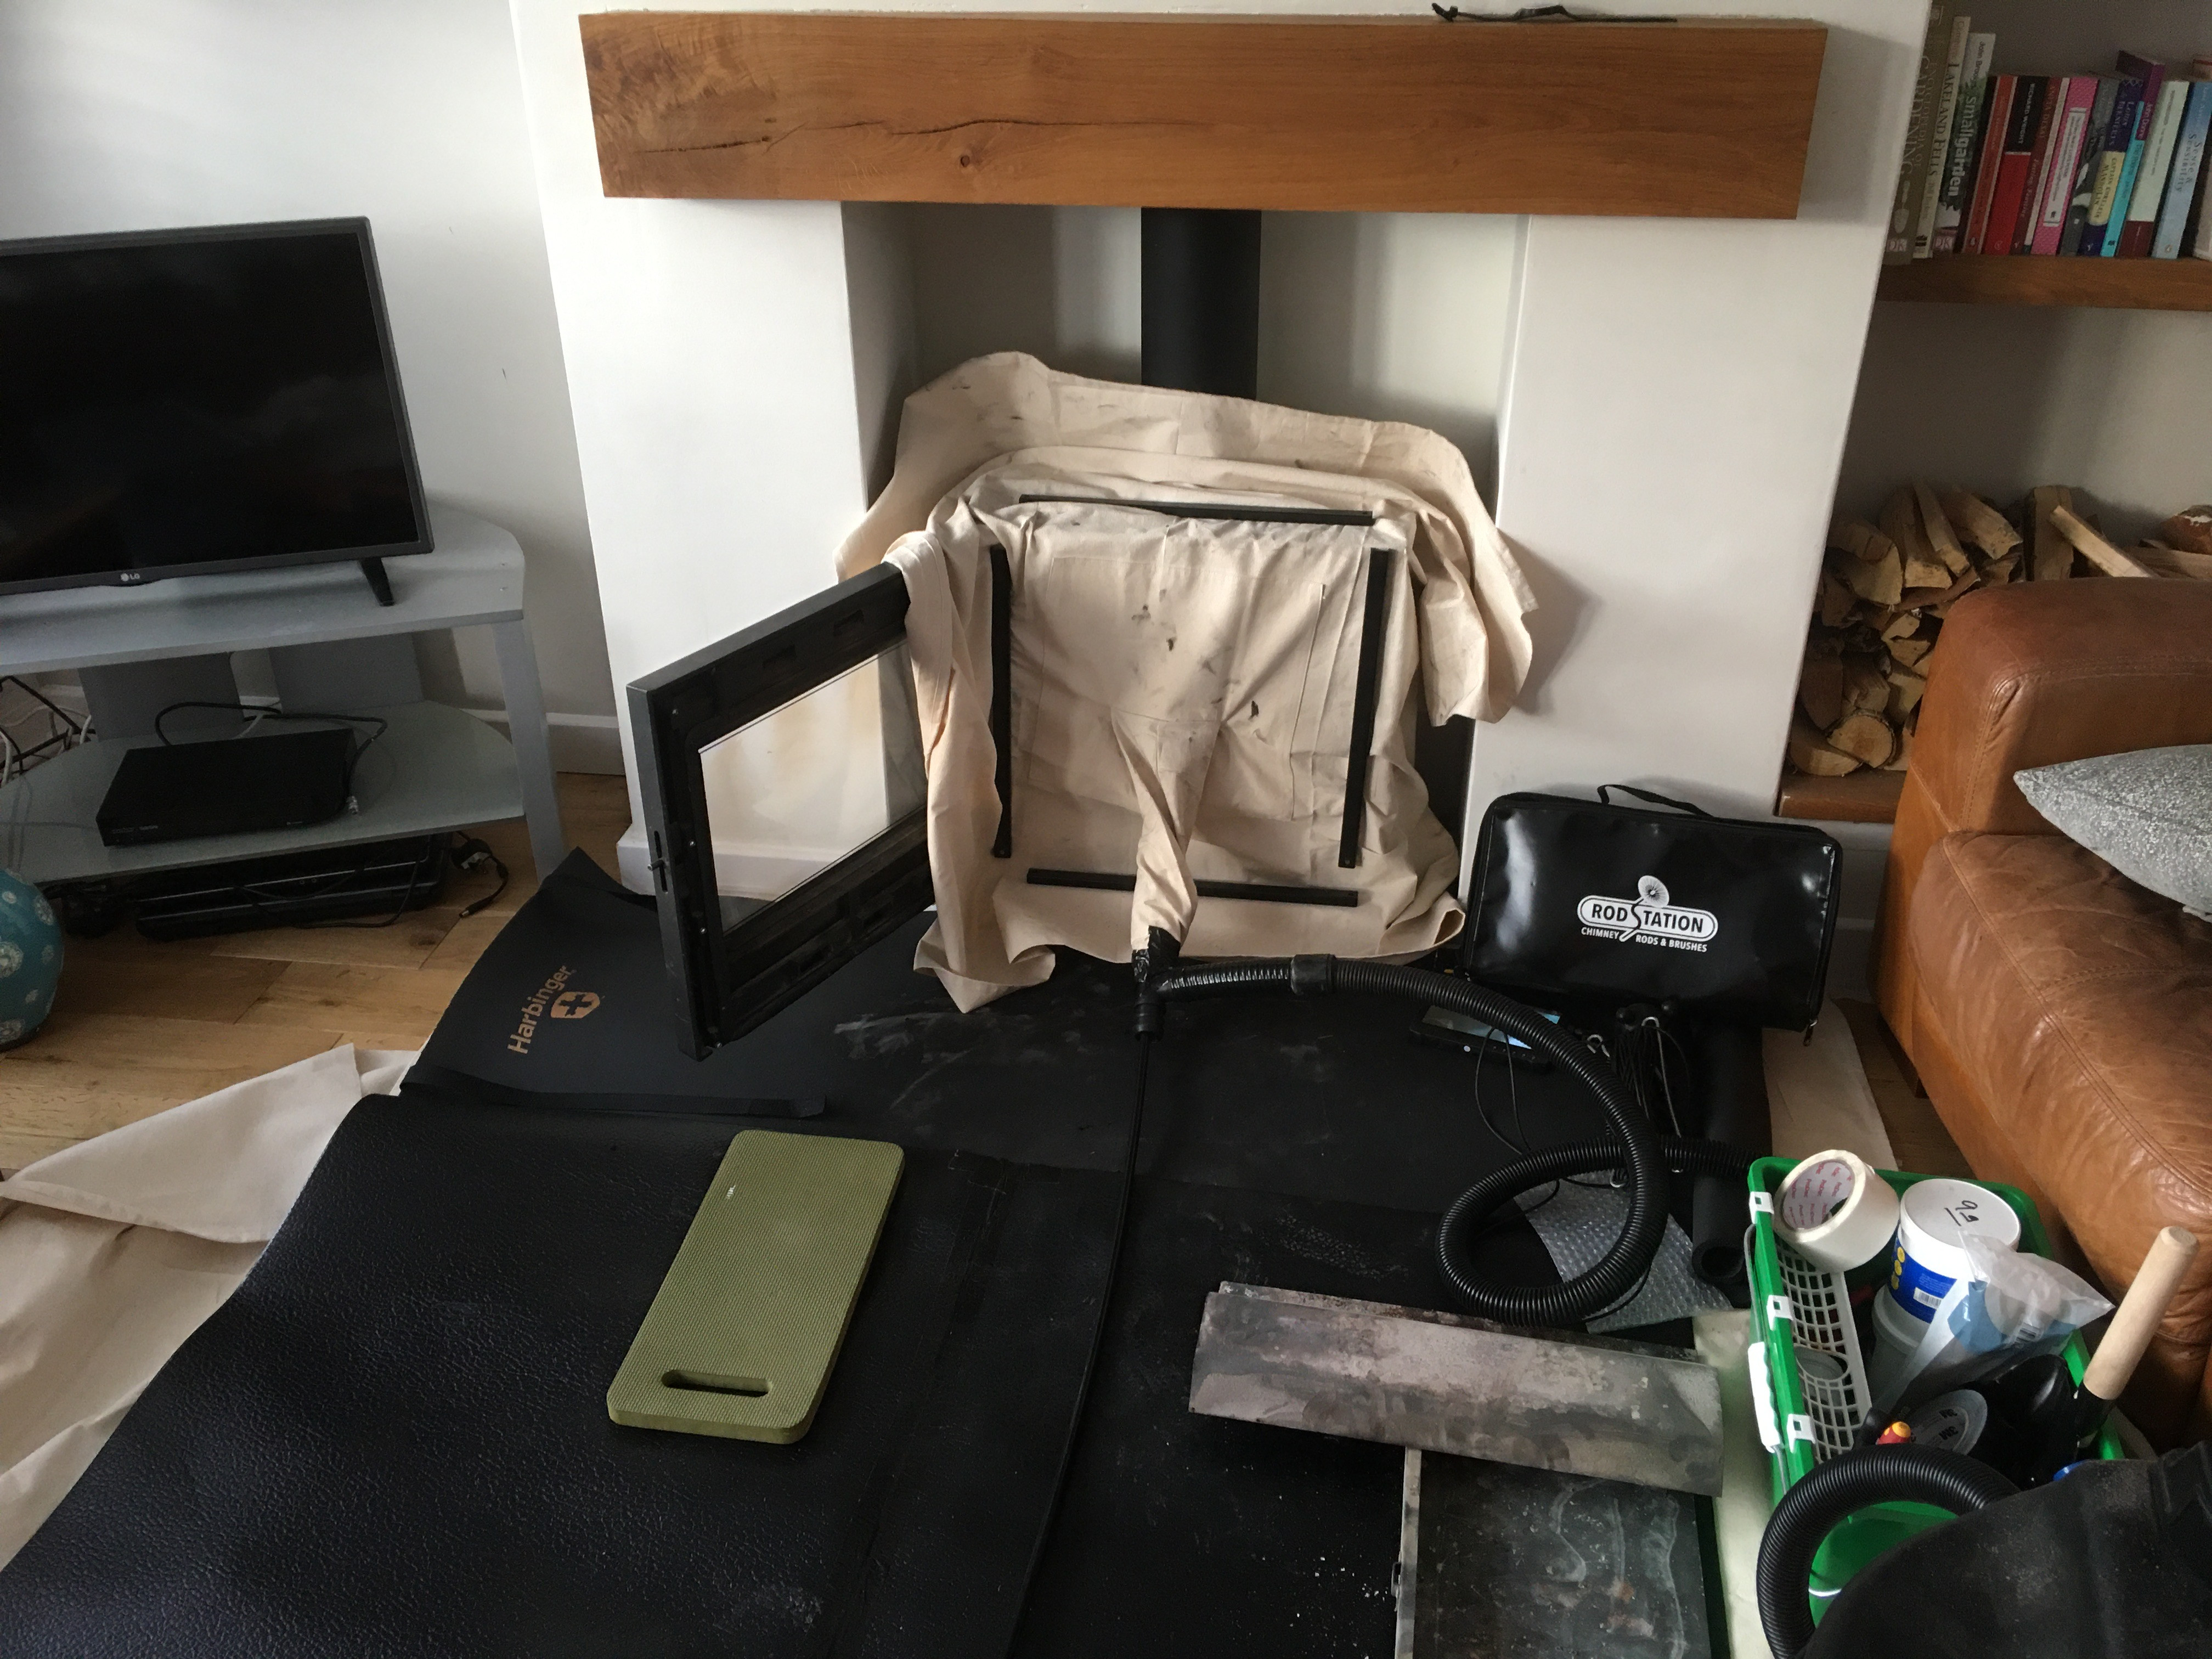 Standard Chimney Sweep - Customer Offer